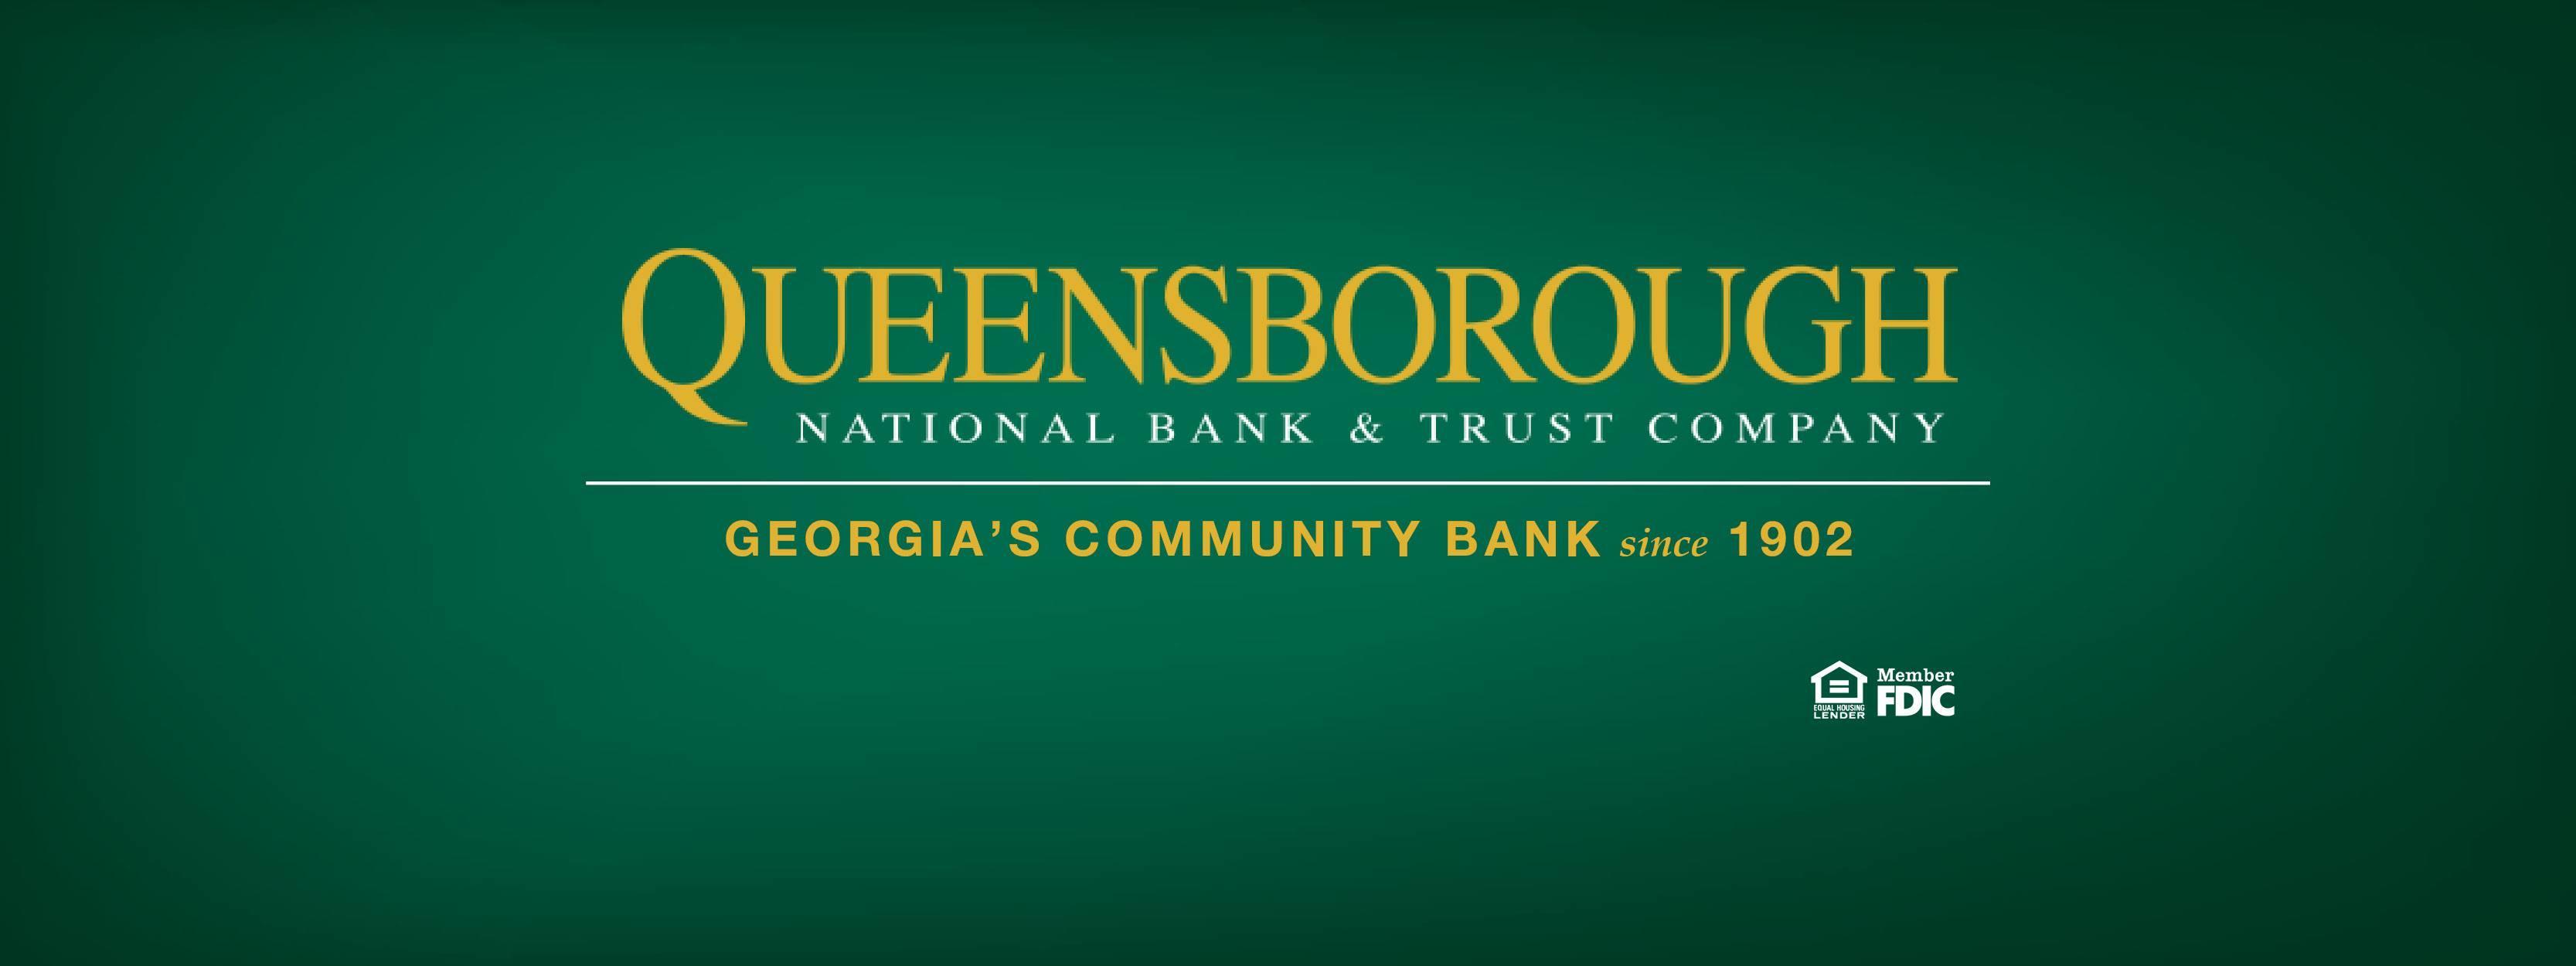 Queensborough National Bank & Trust Company image 0